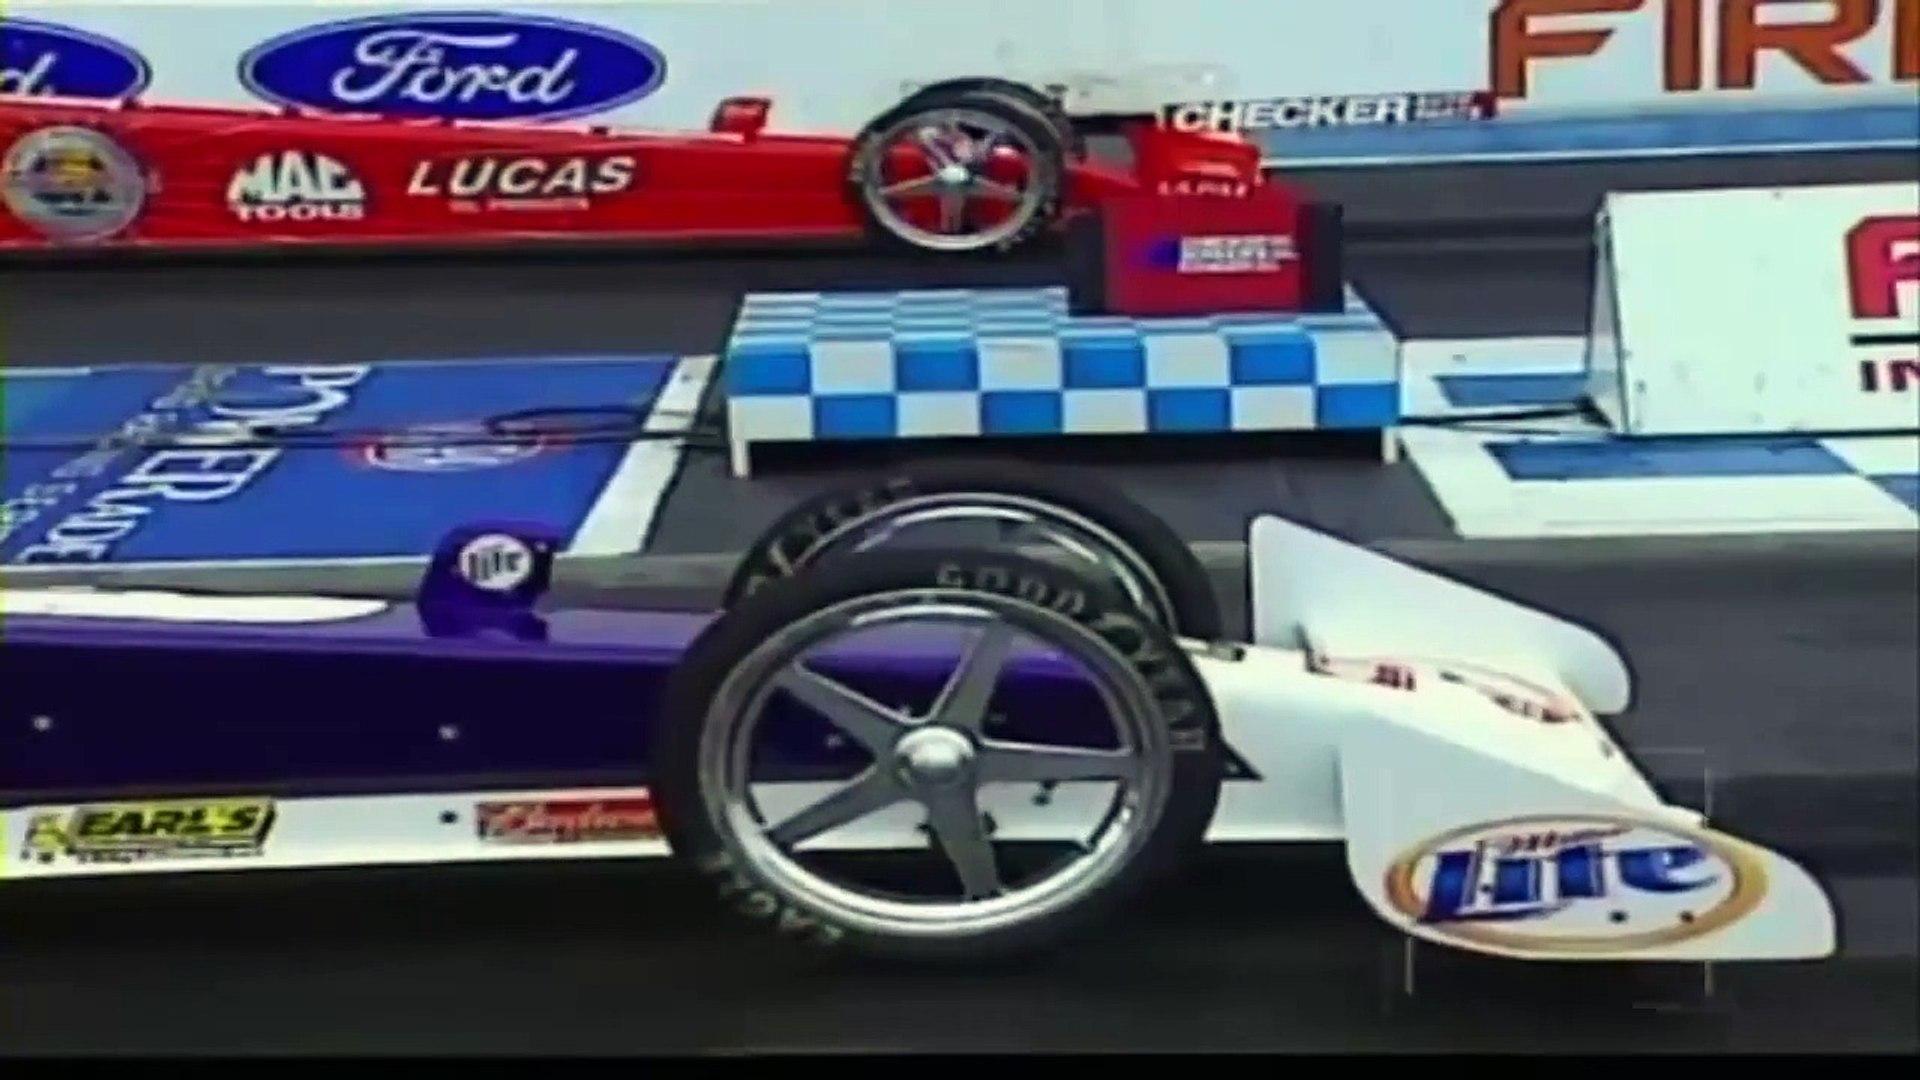 Drag Racing  America s Booming Sport - History Documentary Films